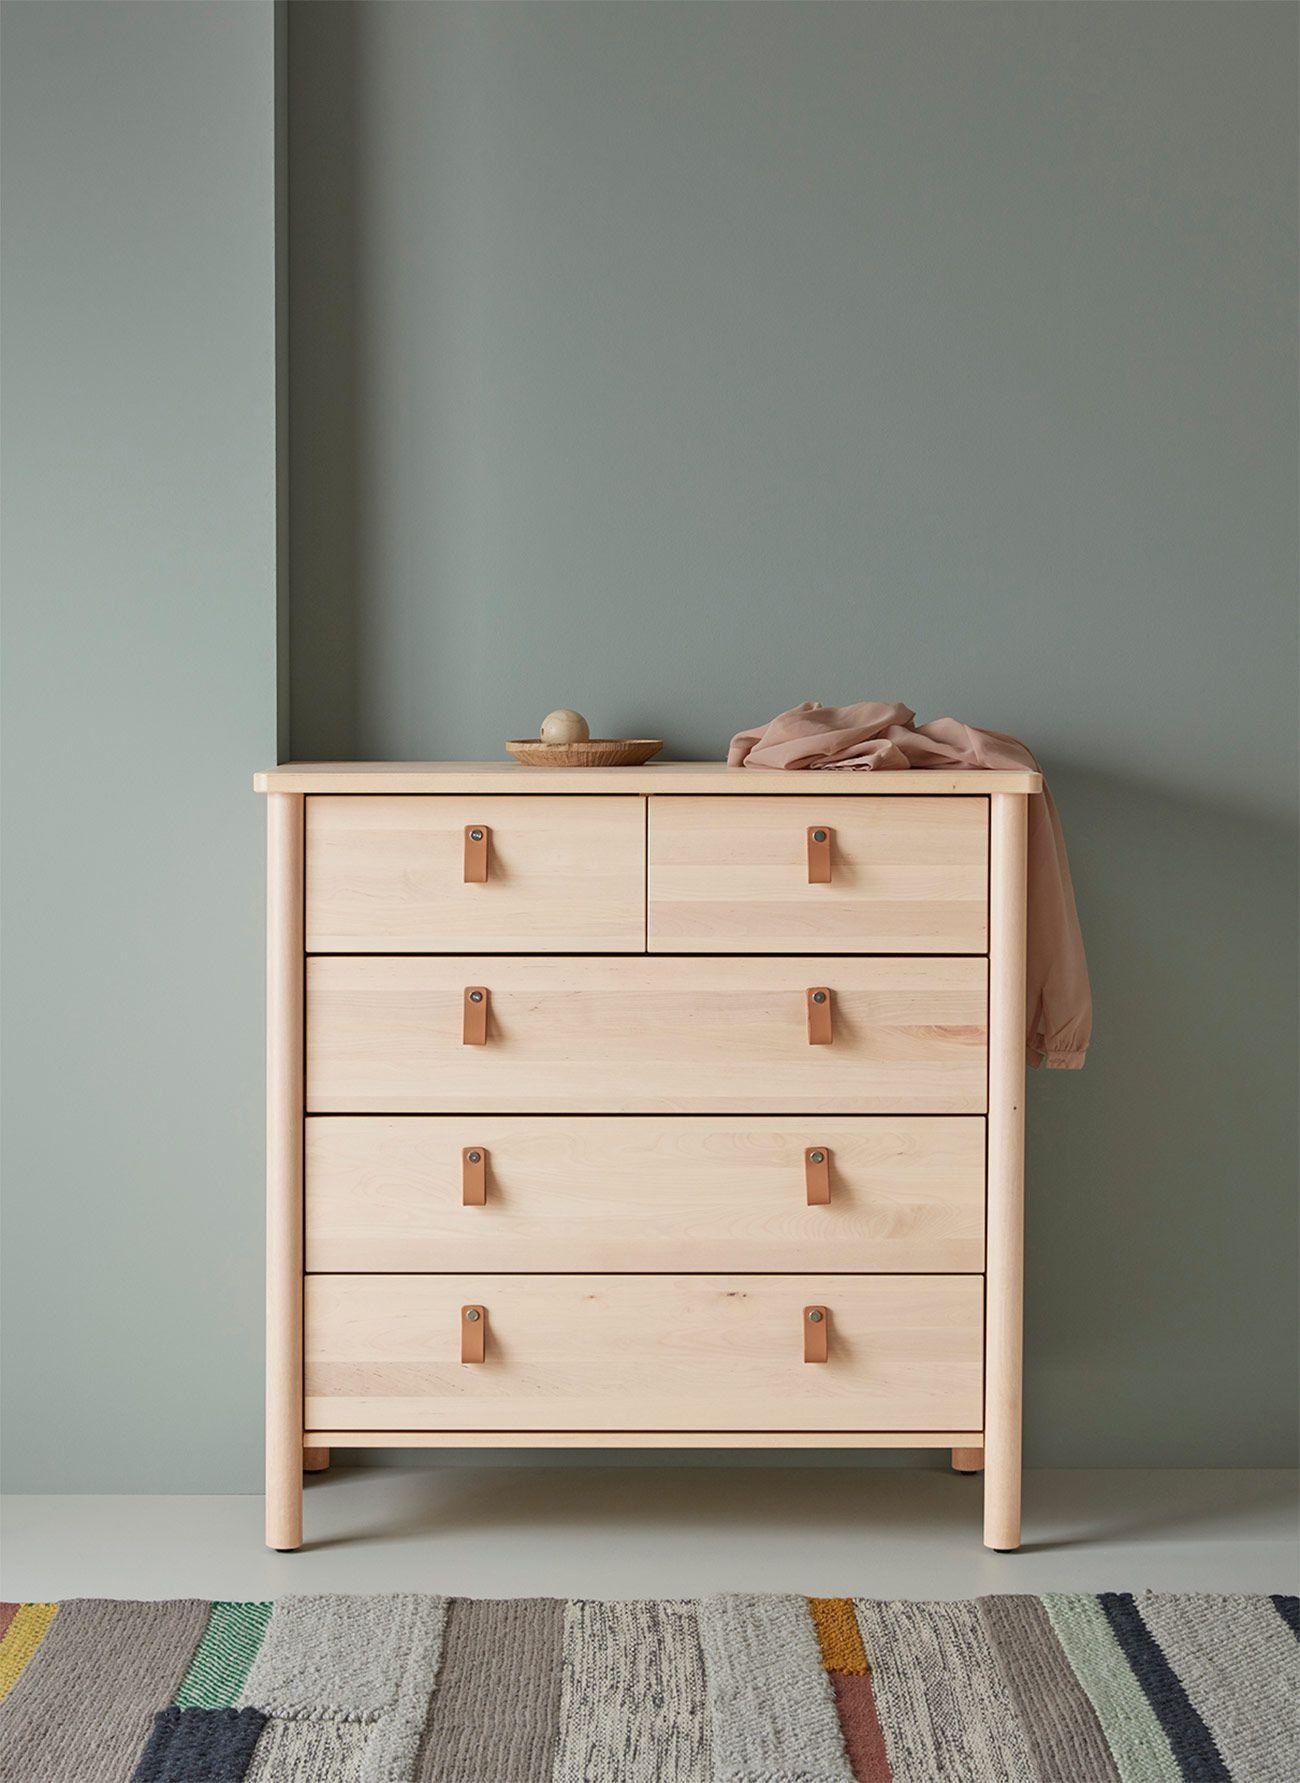 8 Productos Del Nuevo Catálogo De Ikea Que Vas A Querer Home